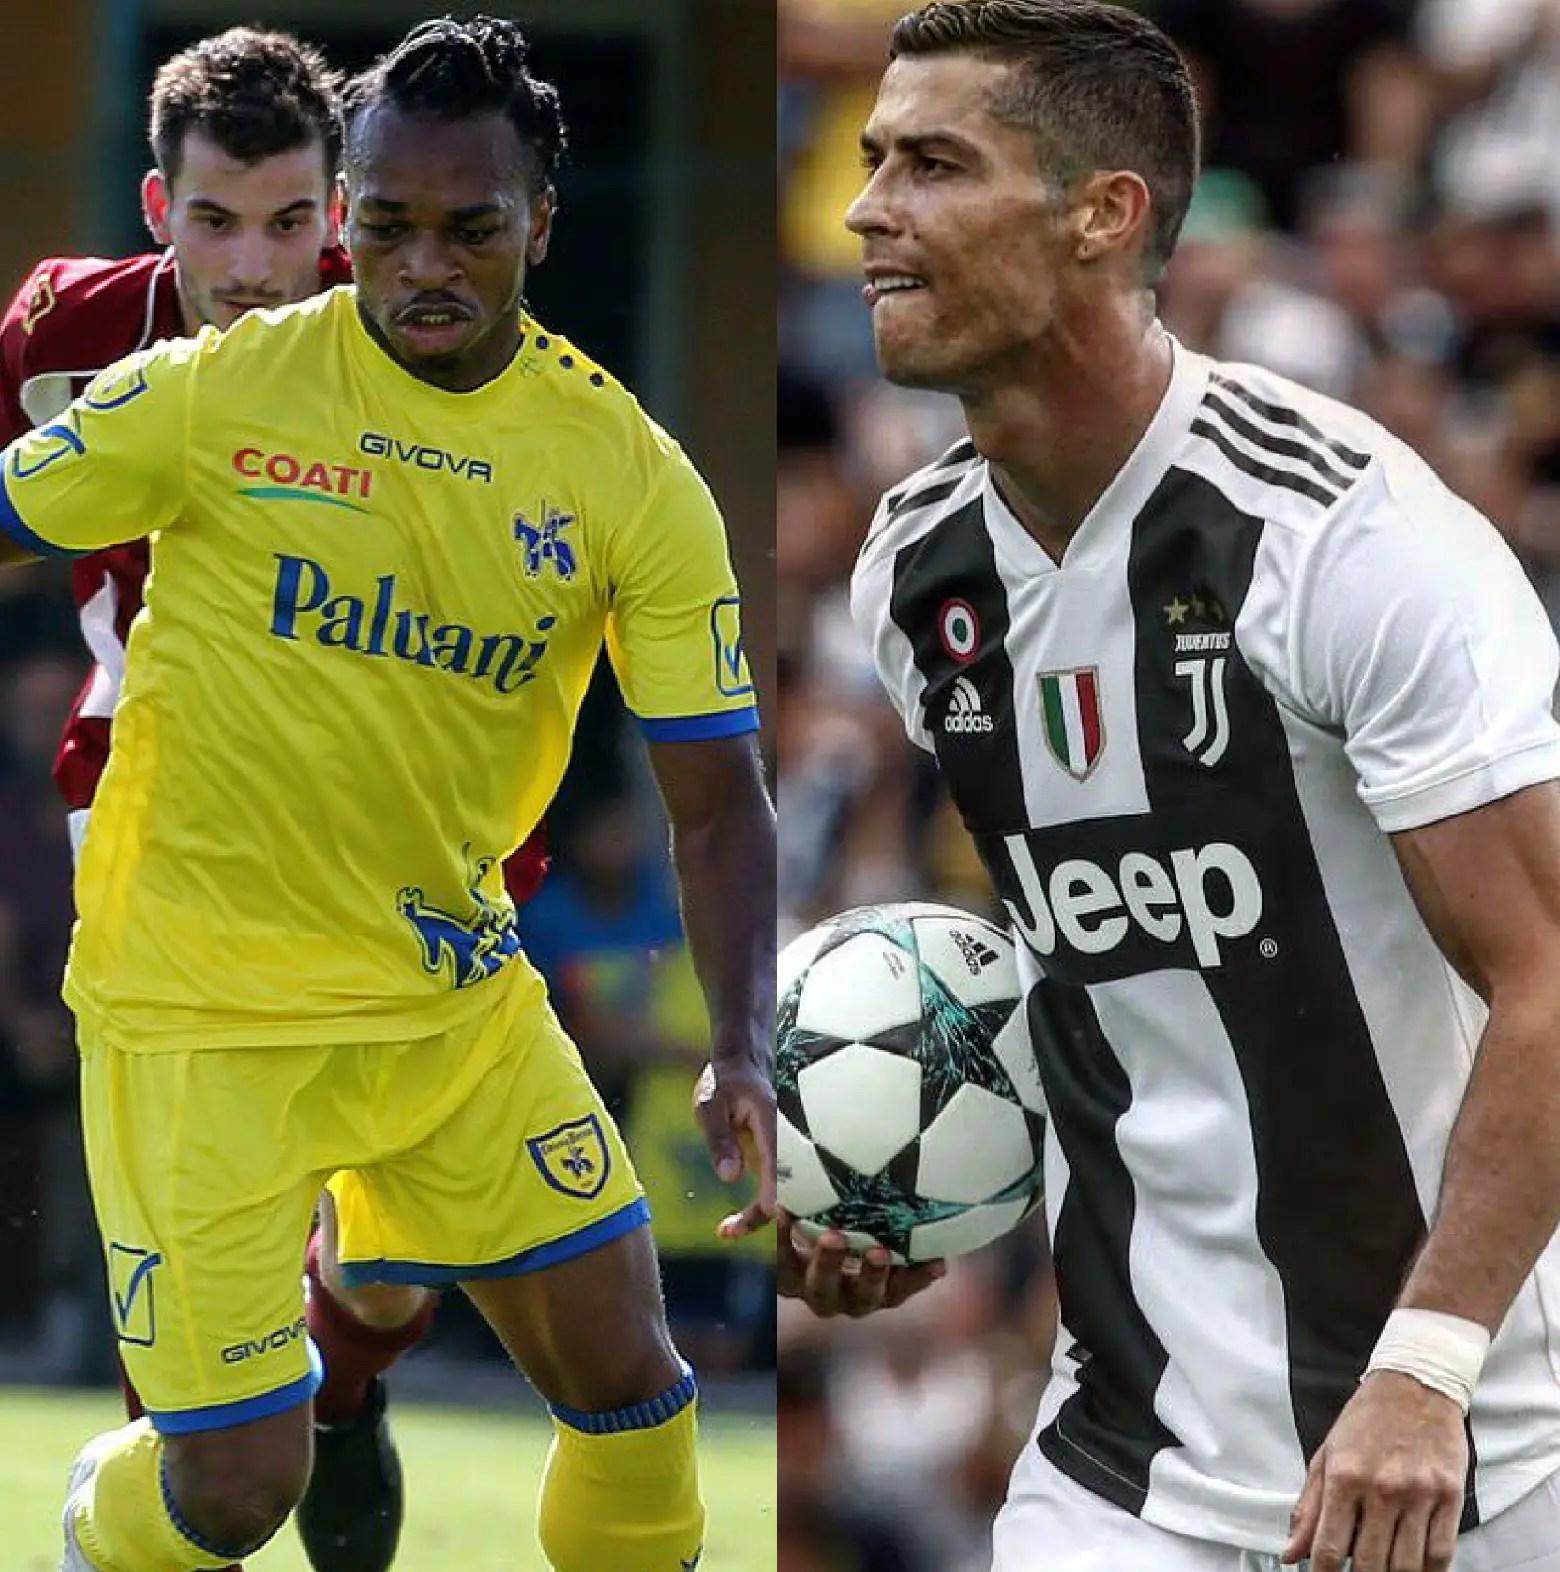 Balogun Dares Lukaku As Brighton, United Clash; Obi Faces Ronaldo In Chievo Vs Juve